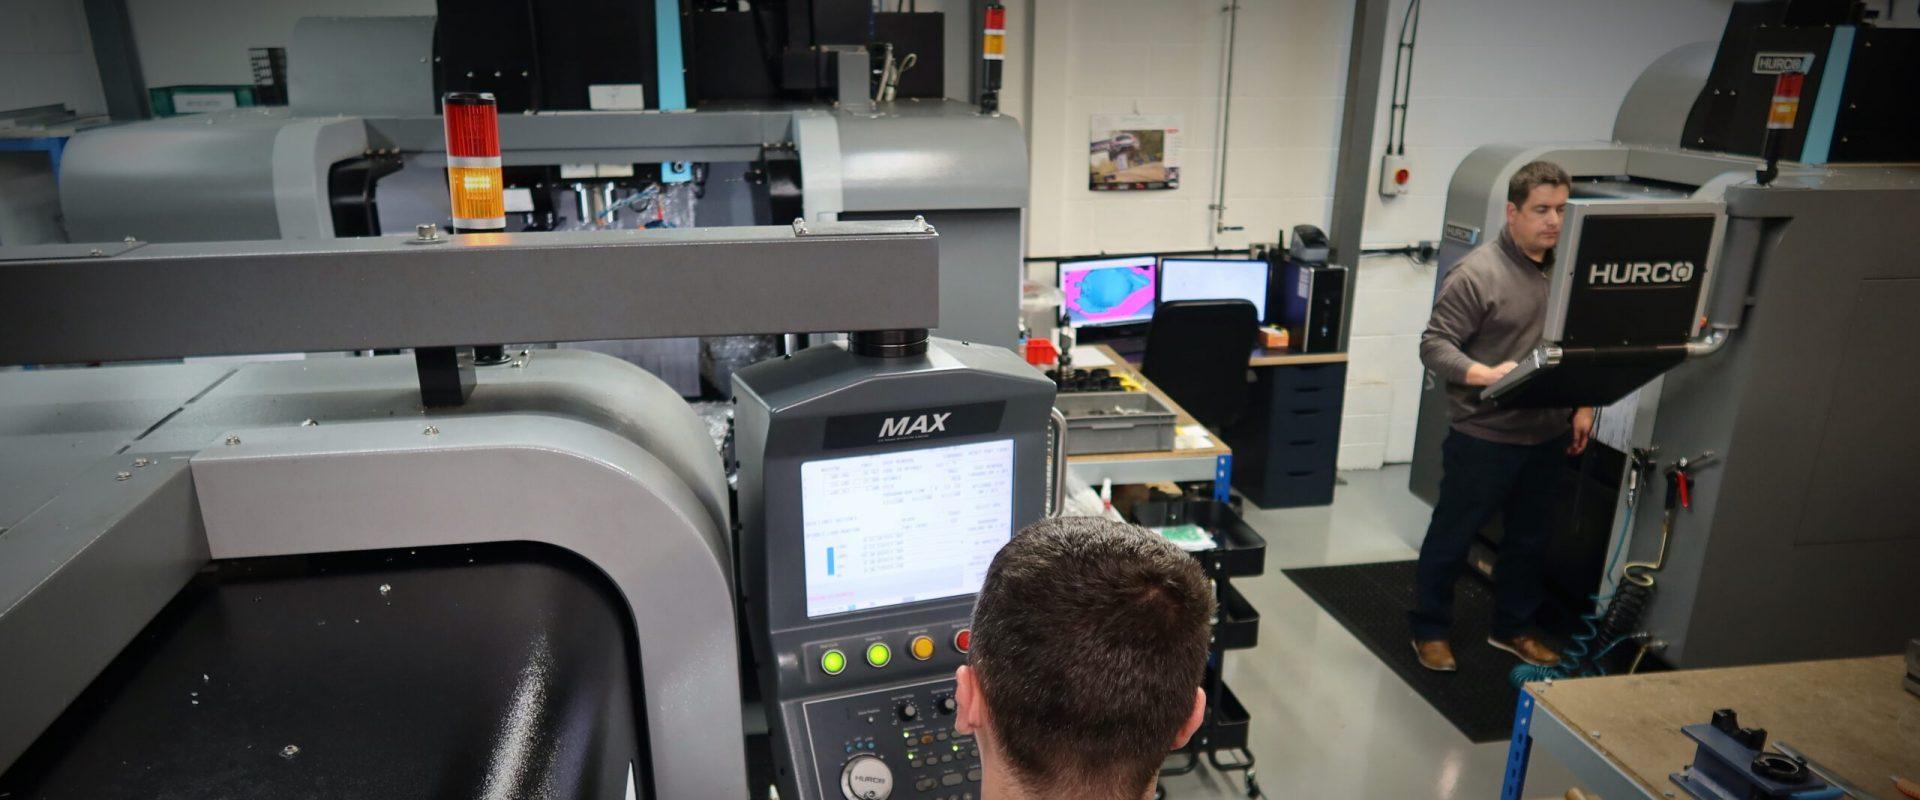 CNC Milling Wiltshire Fast Turnaround